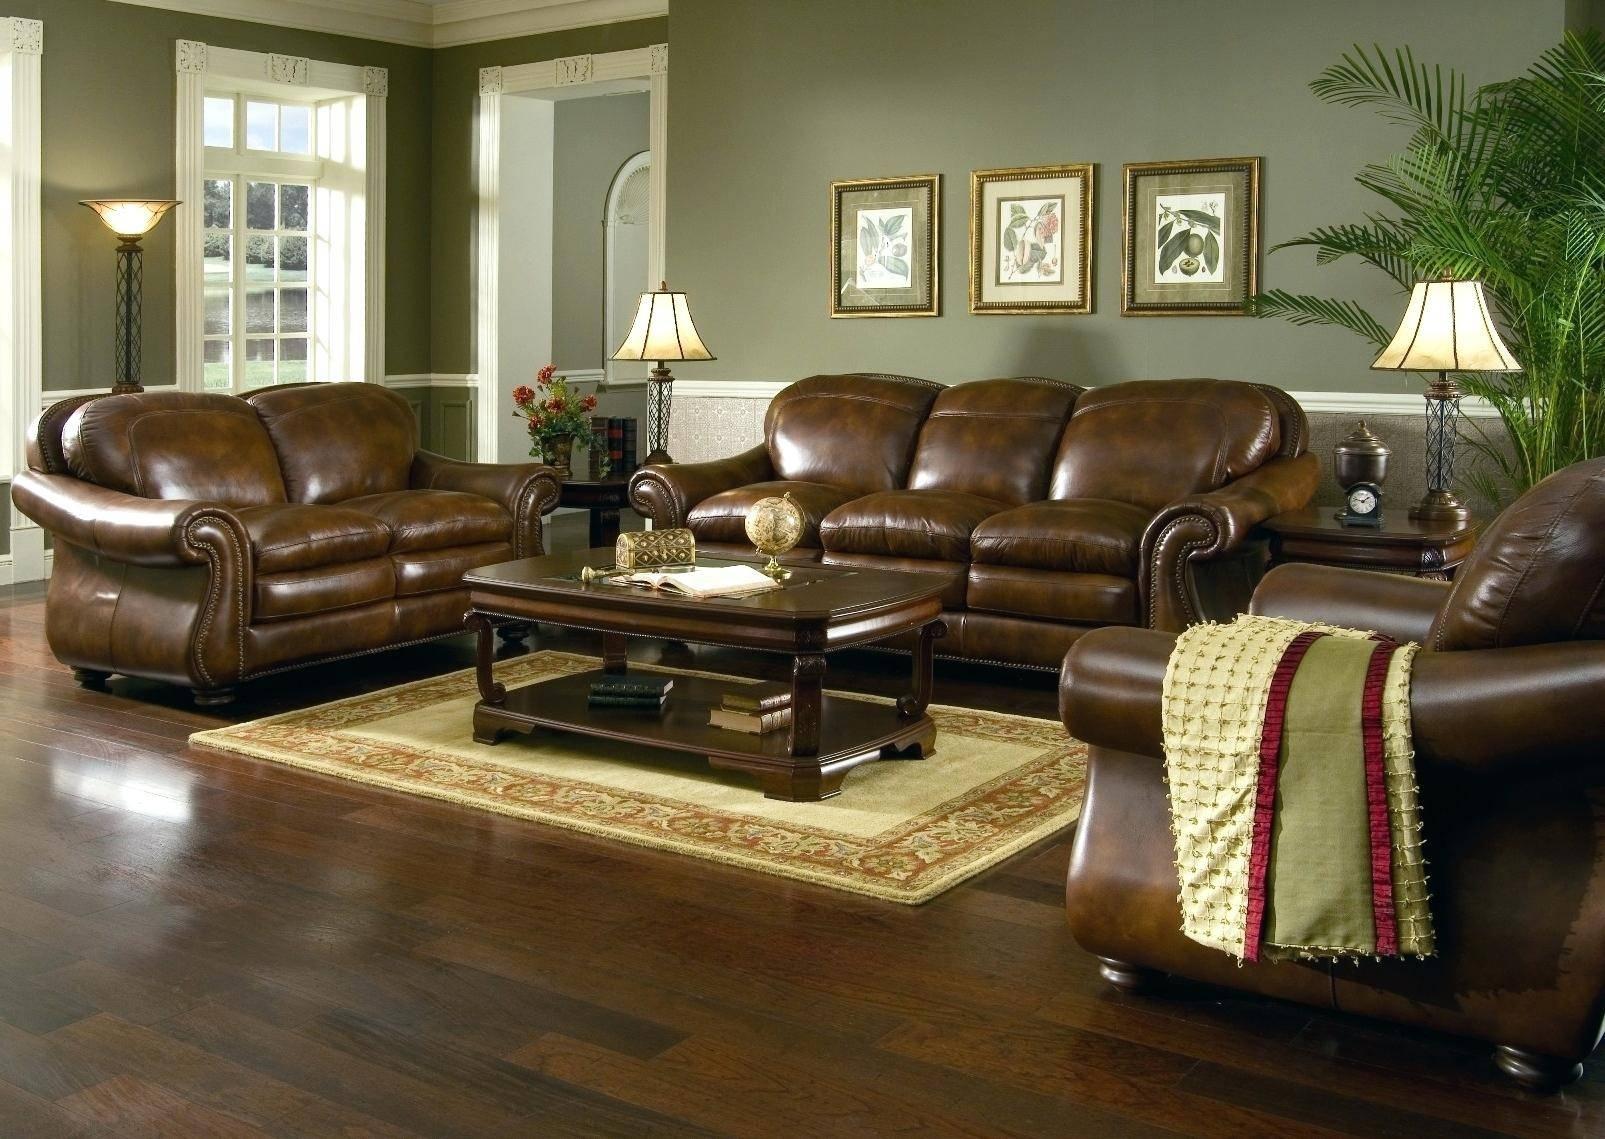 European Leather Sofa Kenwood Black Throws For Sofas – Lenspay inside European Leather Sofas (Image 7 of 30)